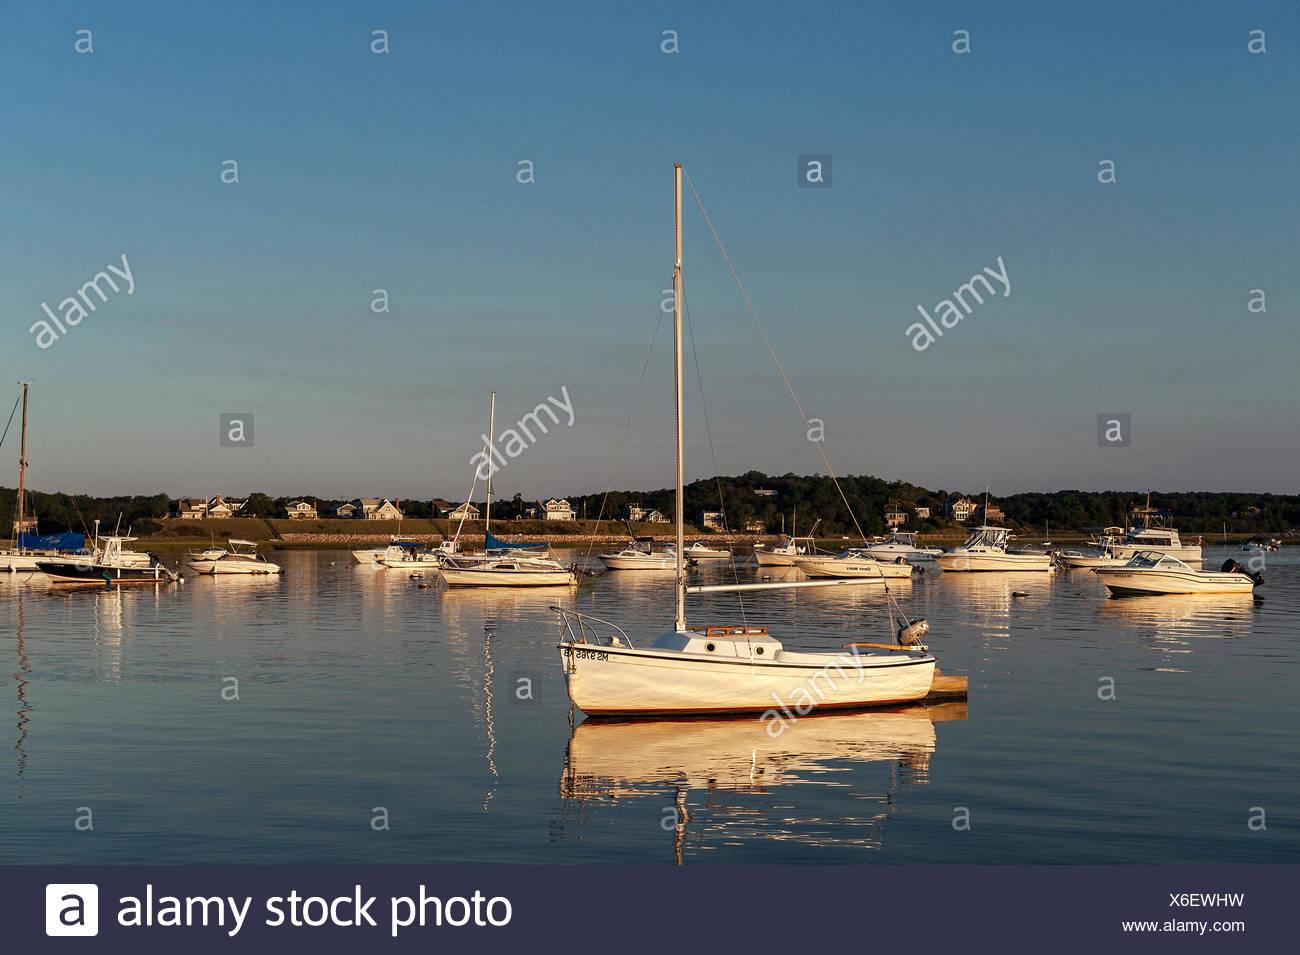 Sailboat, Wellfleet, Cape Cod, Massachusetts, USA - Stock Image